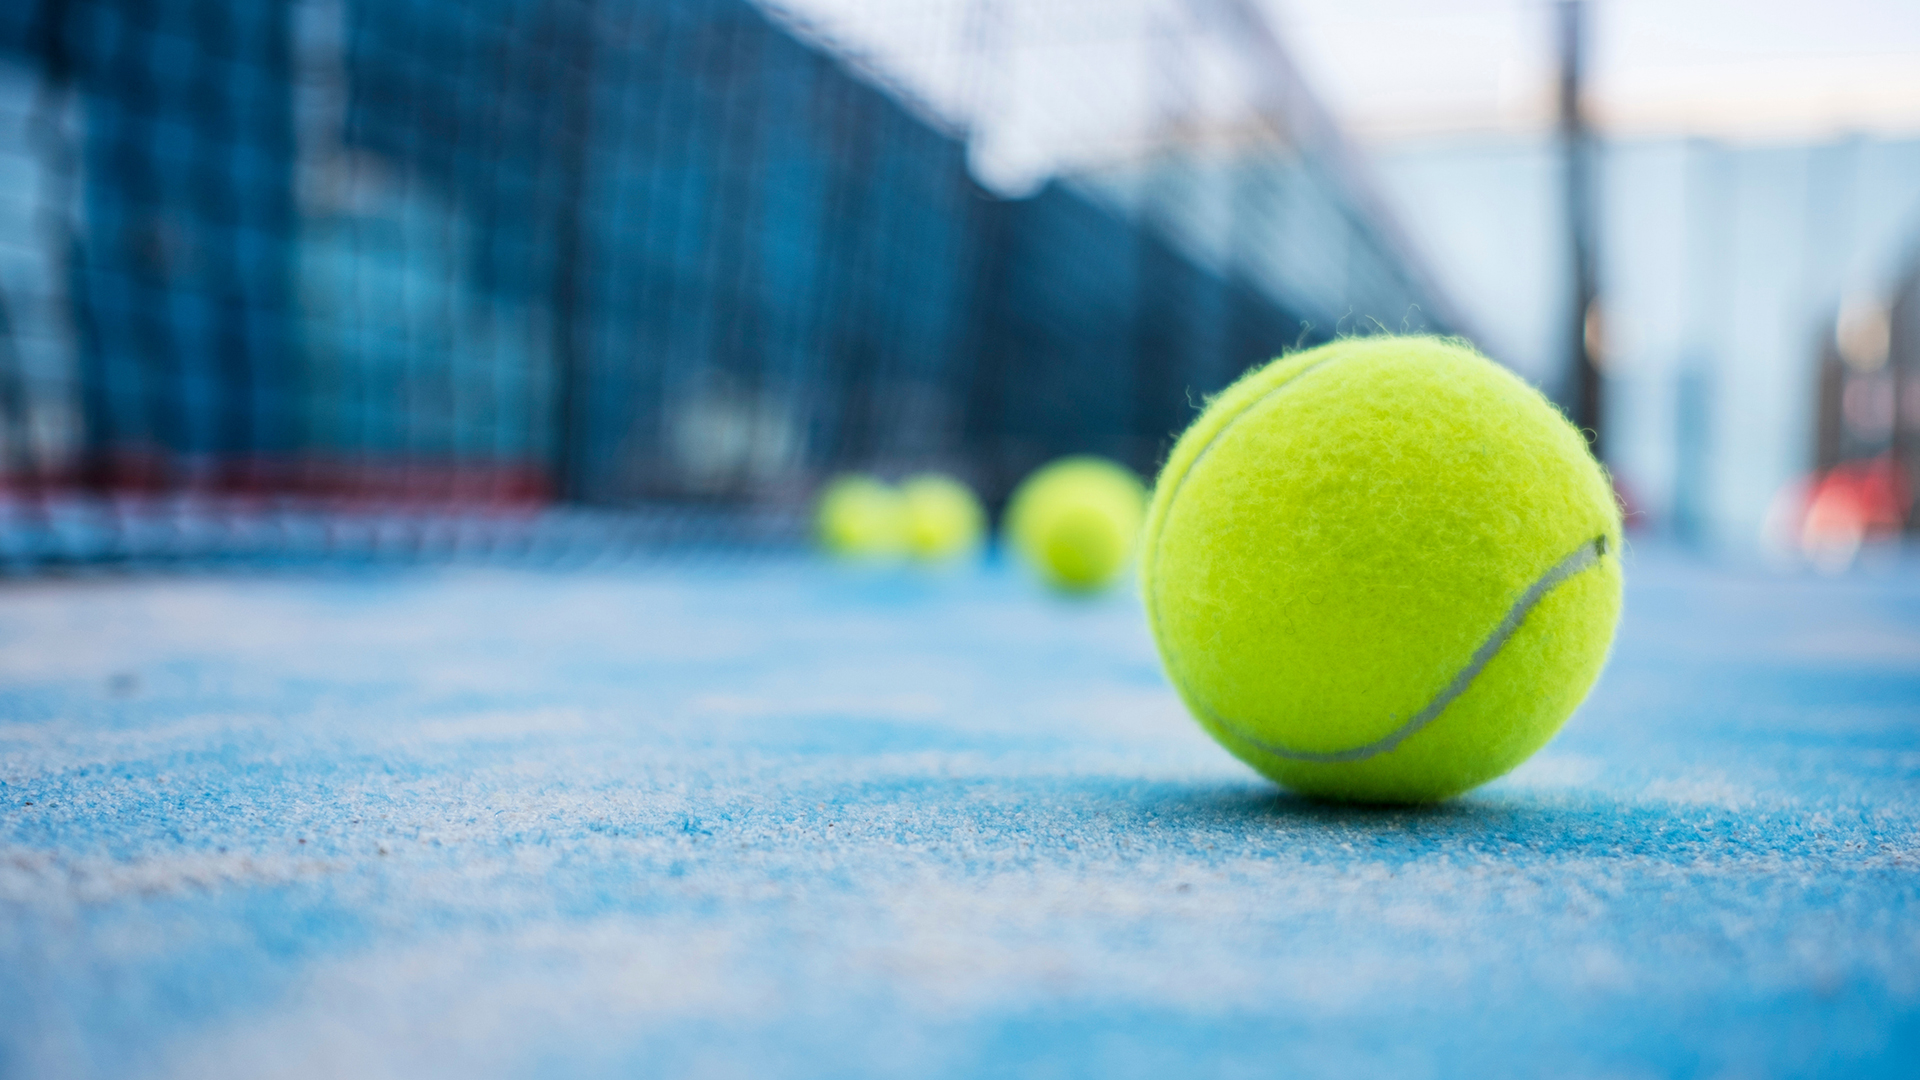 Samantha Stosur vs. Madison Keys